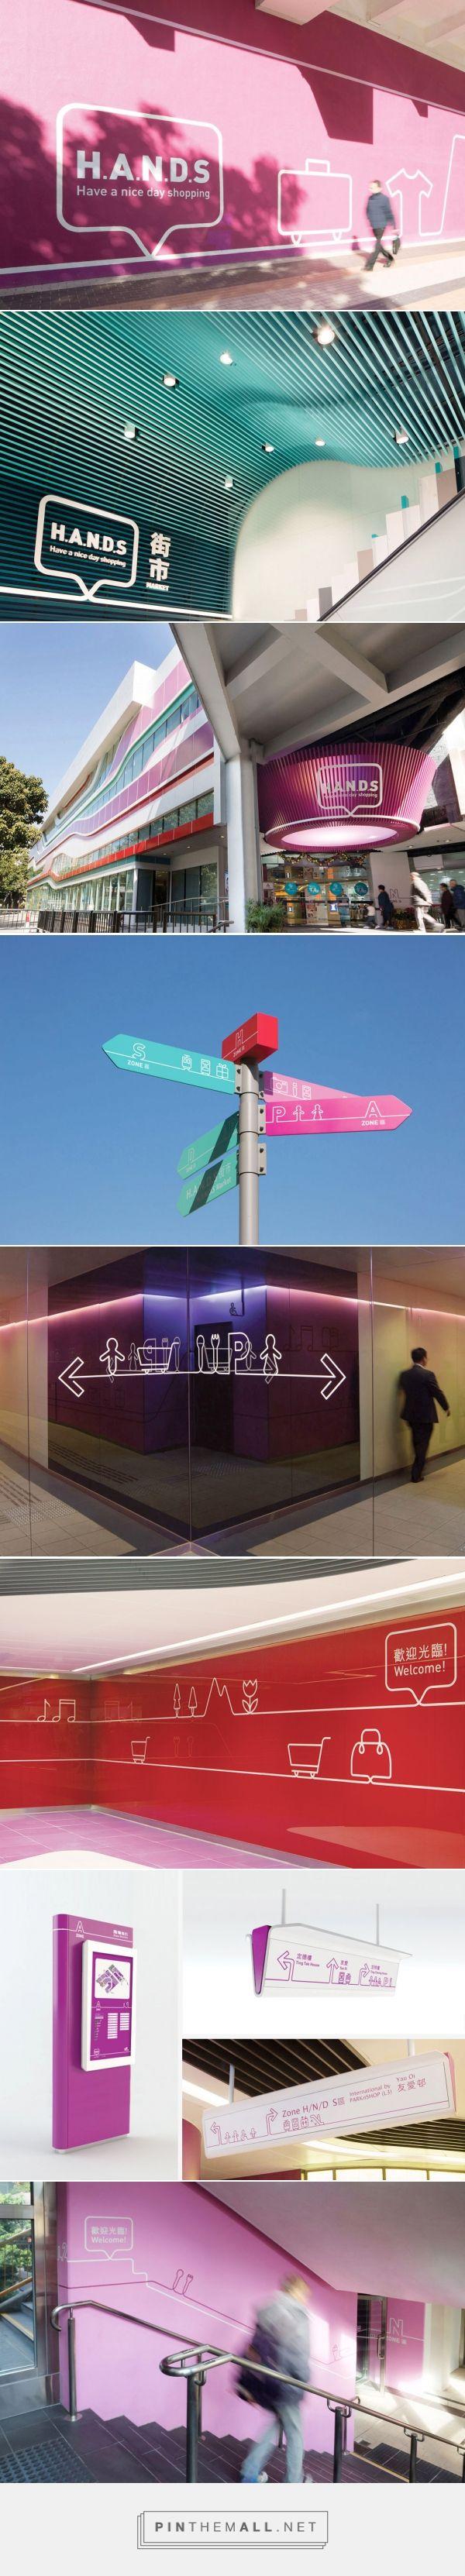 H.A.N.D.S Shopping Mall | Enviromeant